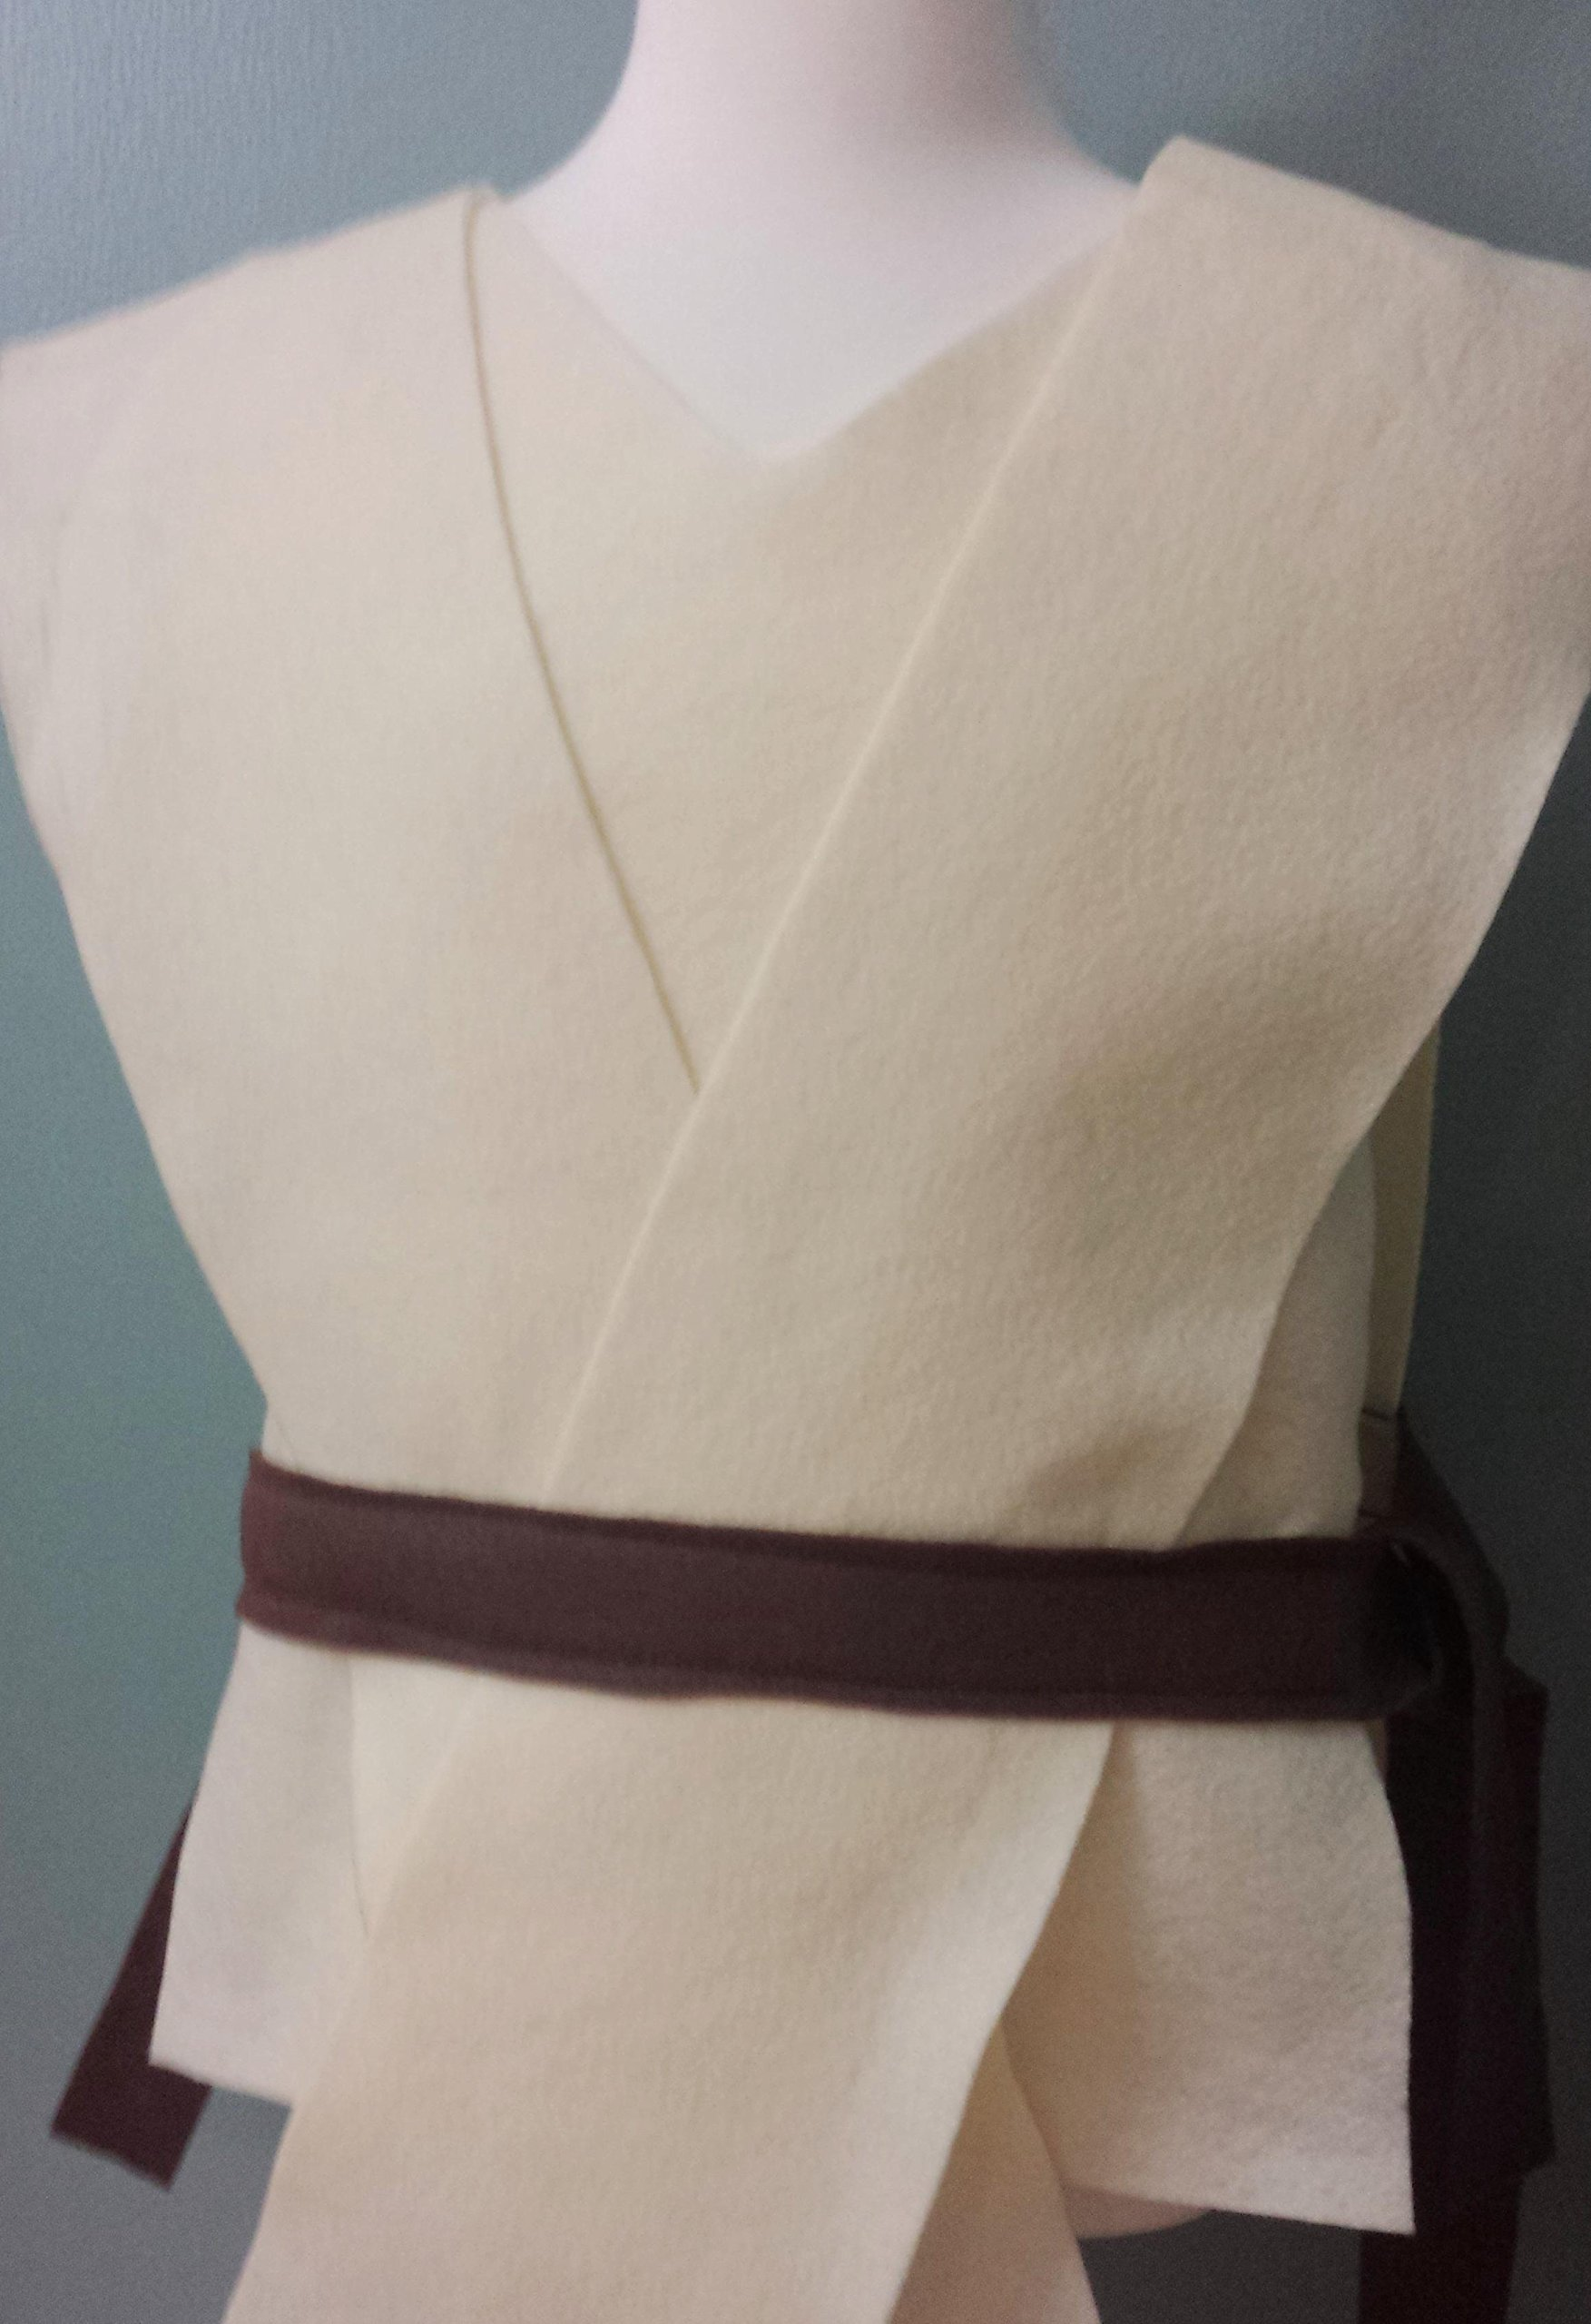 Kids Star Wars Jedi Rey Costume Tunic - Perfect for under your Jedi Robe! (Luke Skywalker/Obi Wan Kenobi) - Baby/Toddler/Kids/Teen/Adult Sizes